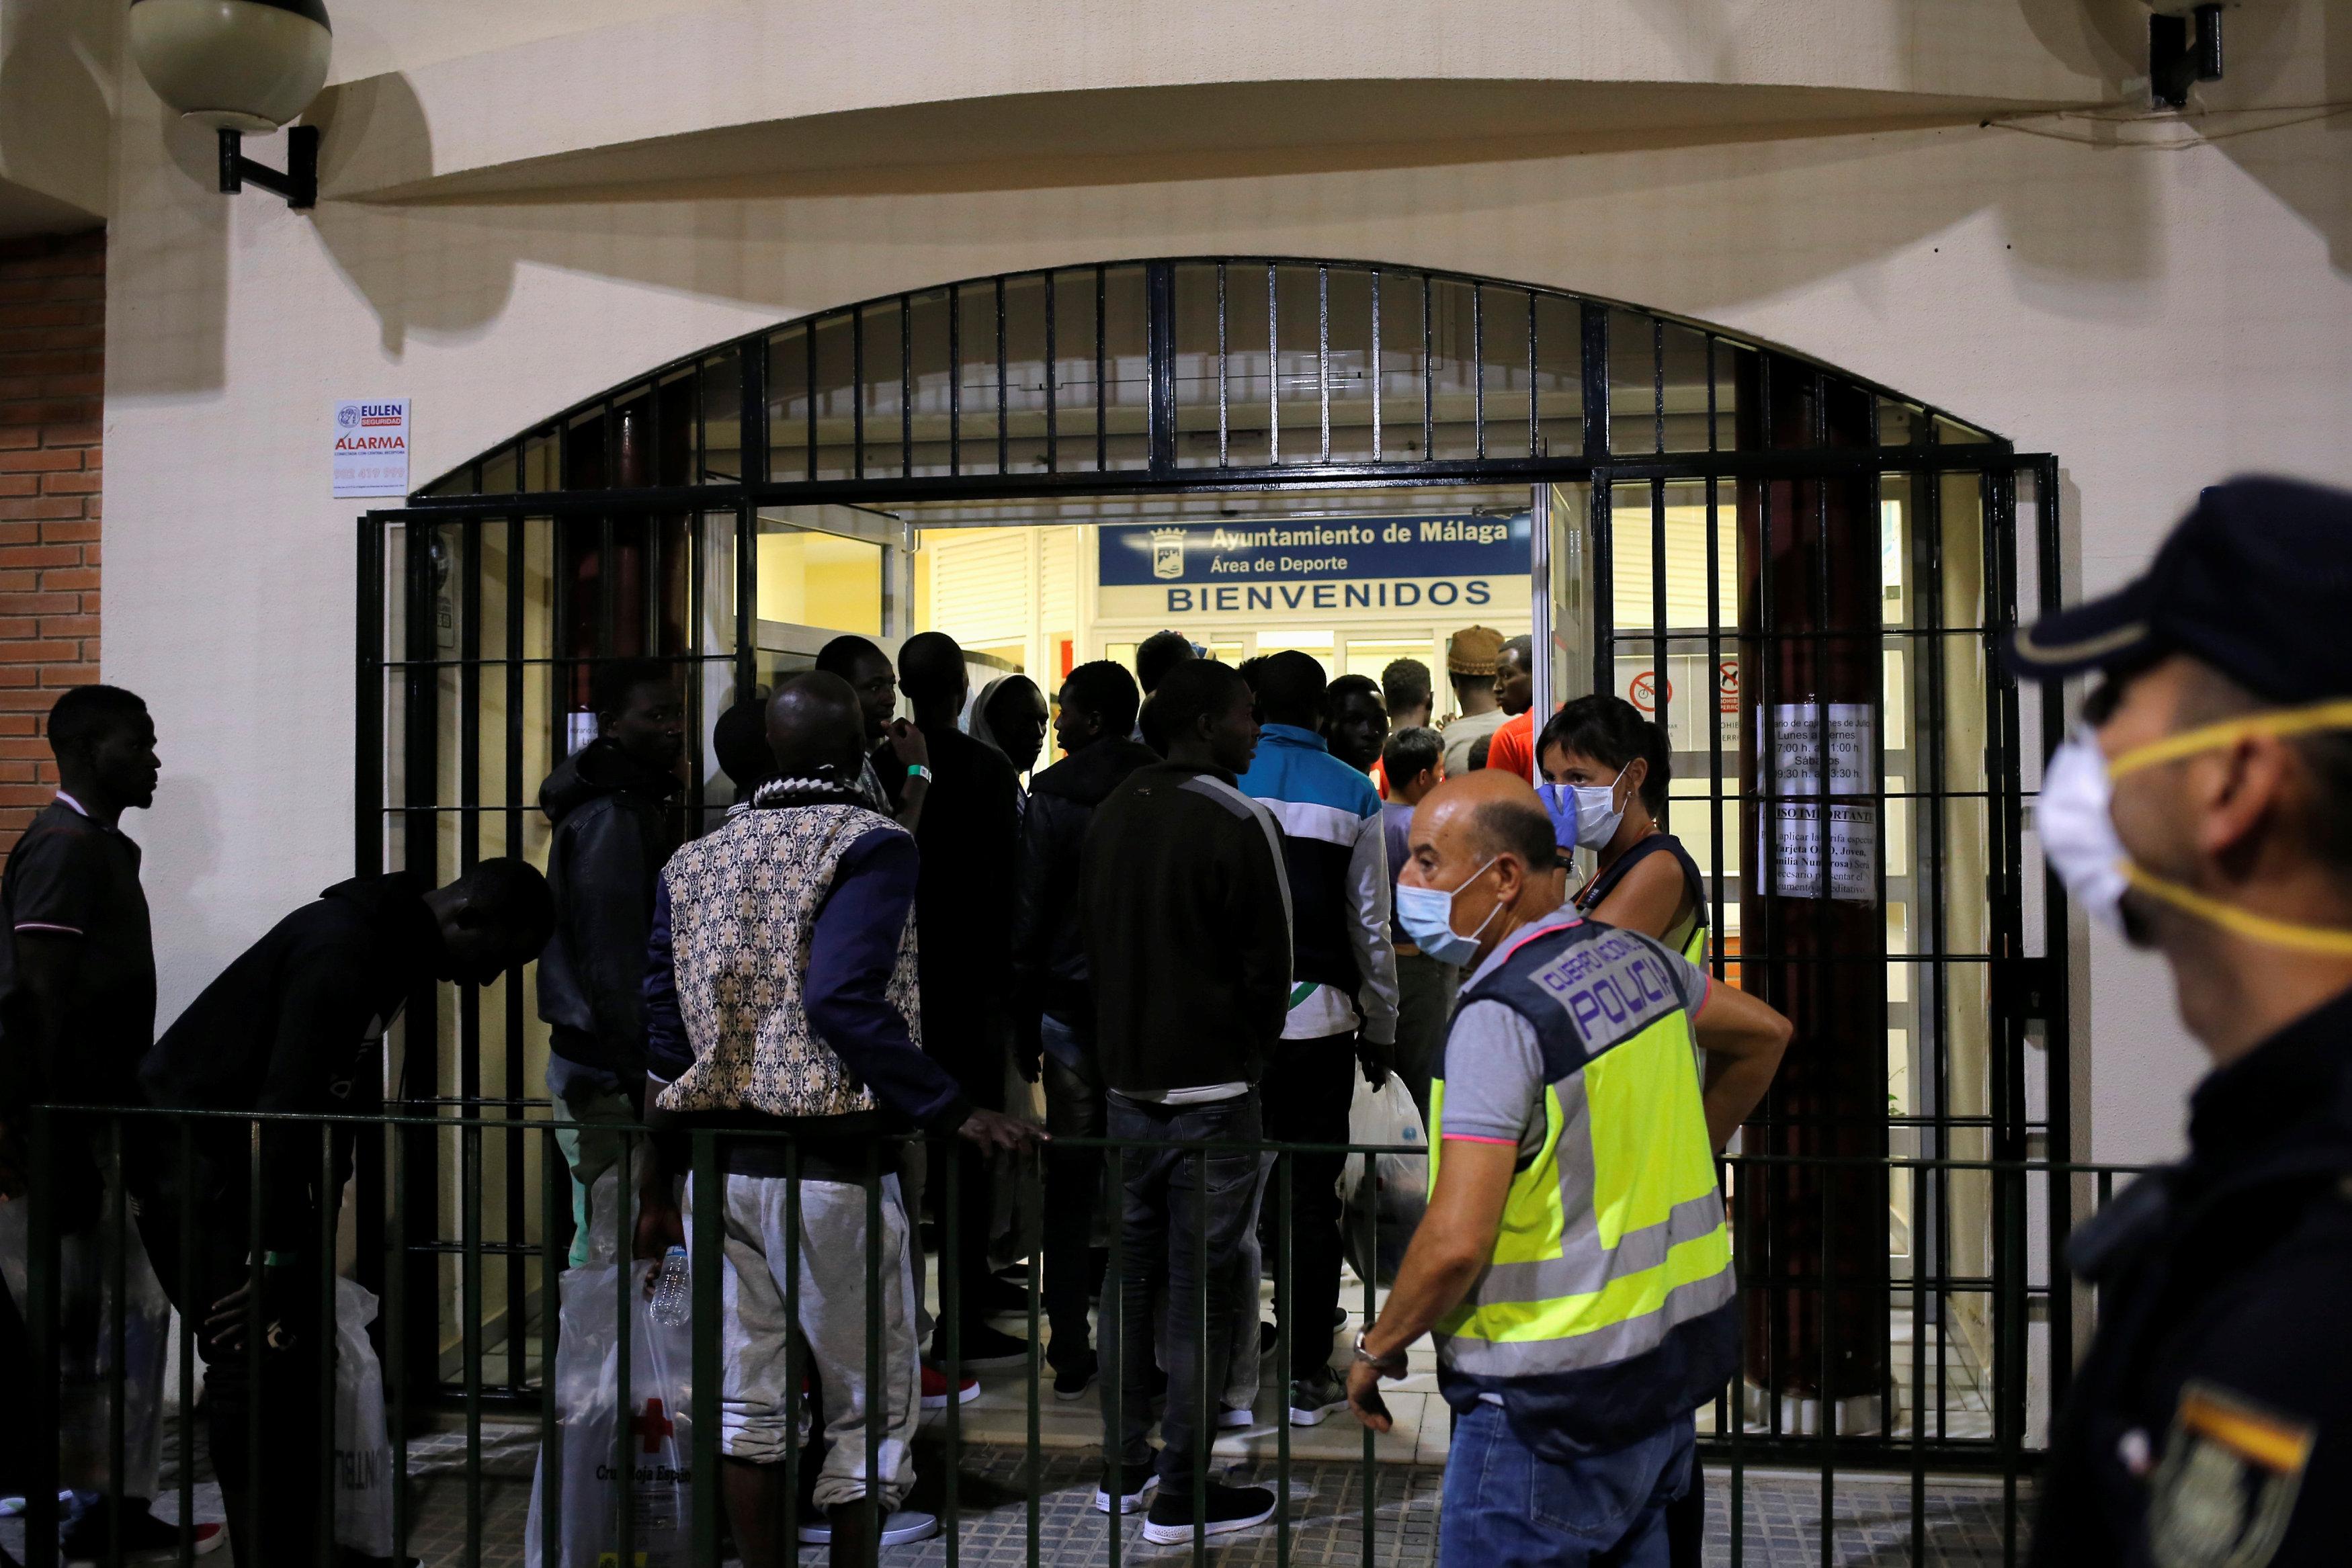 مركز احتجاز فى إسبانيا